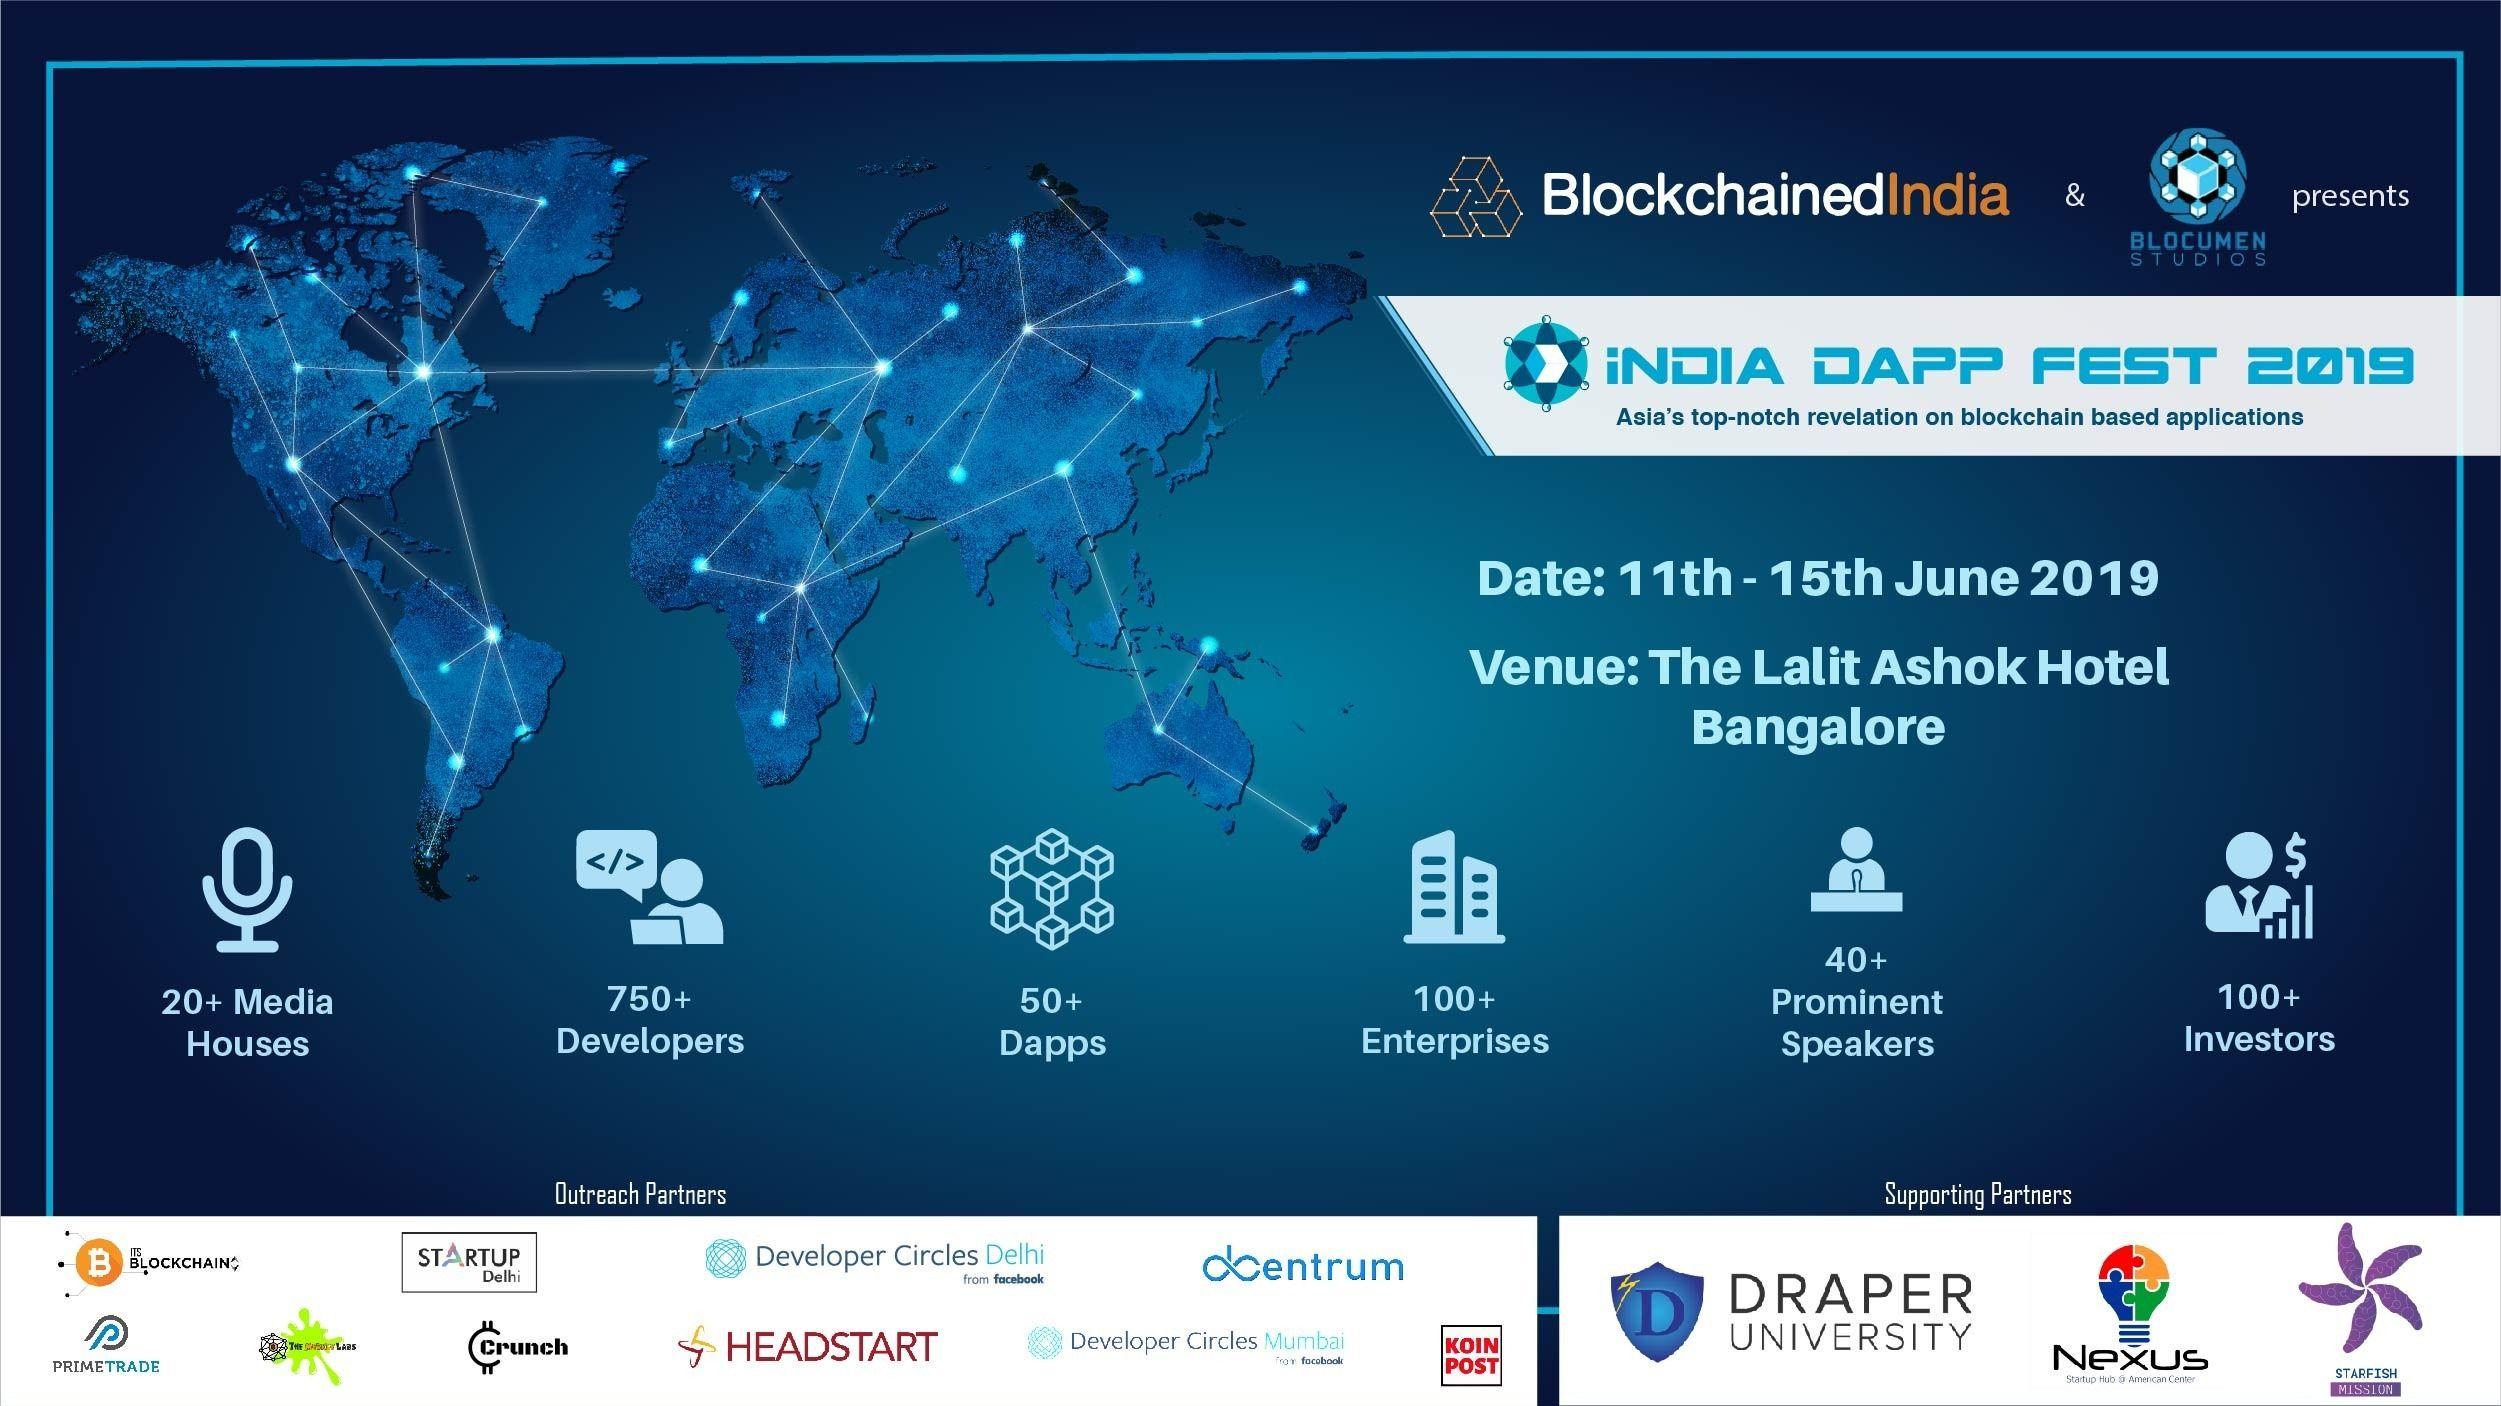 Blockchained India